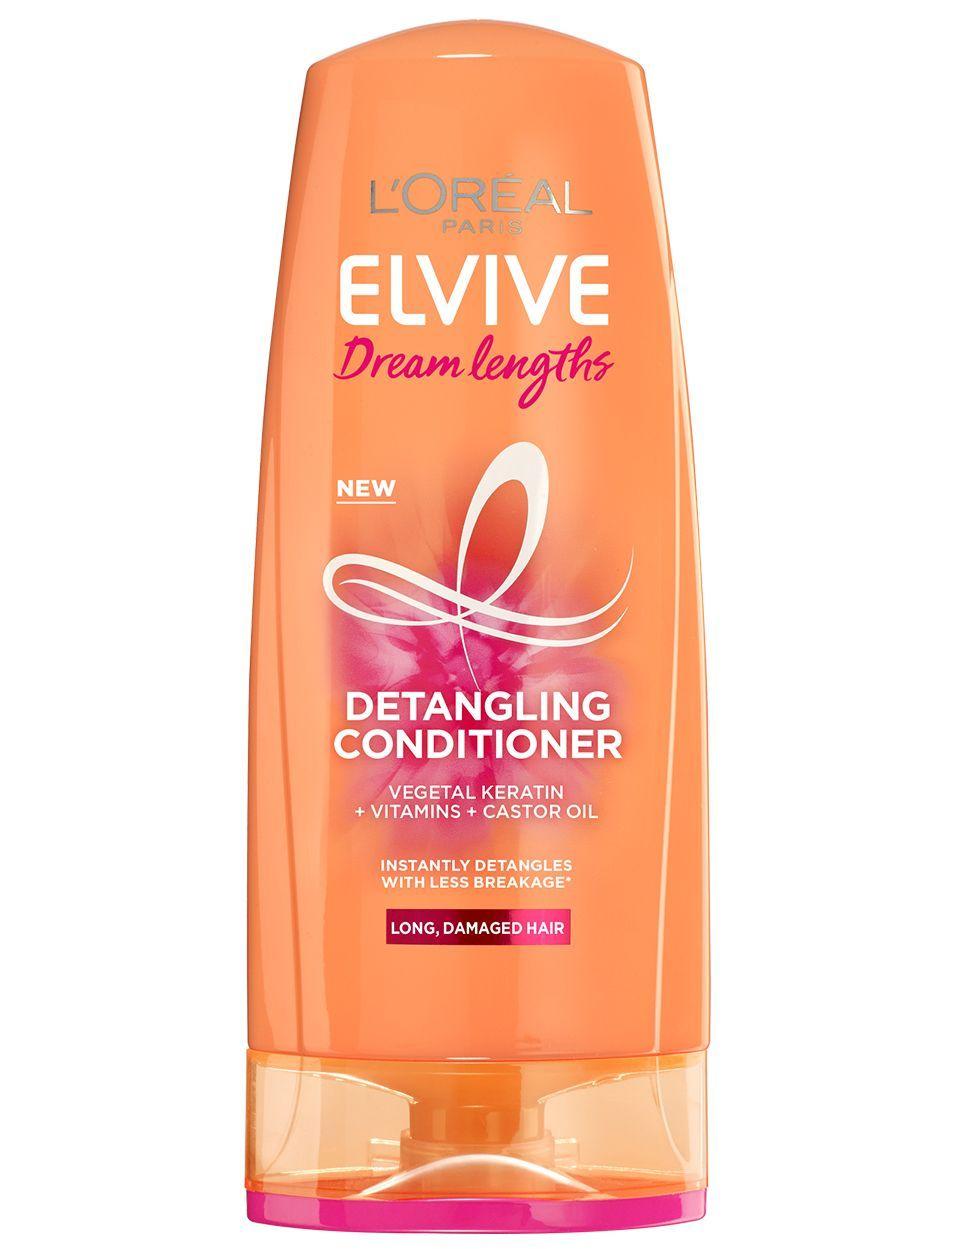 ELVIVE Dream Lengths Detangling Conditioner